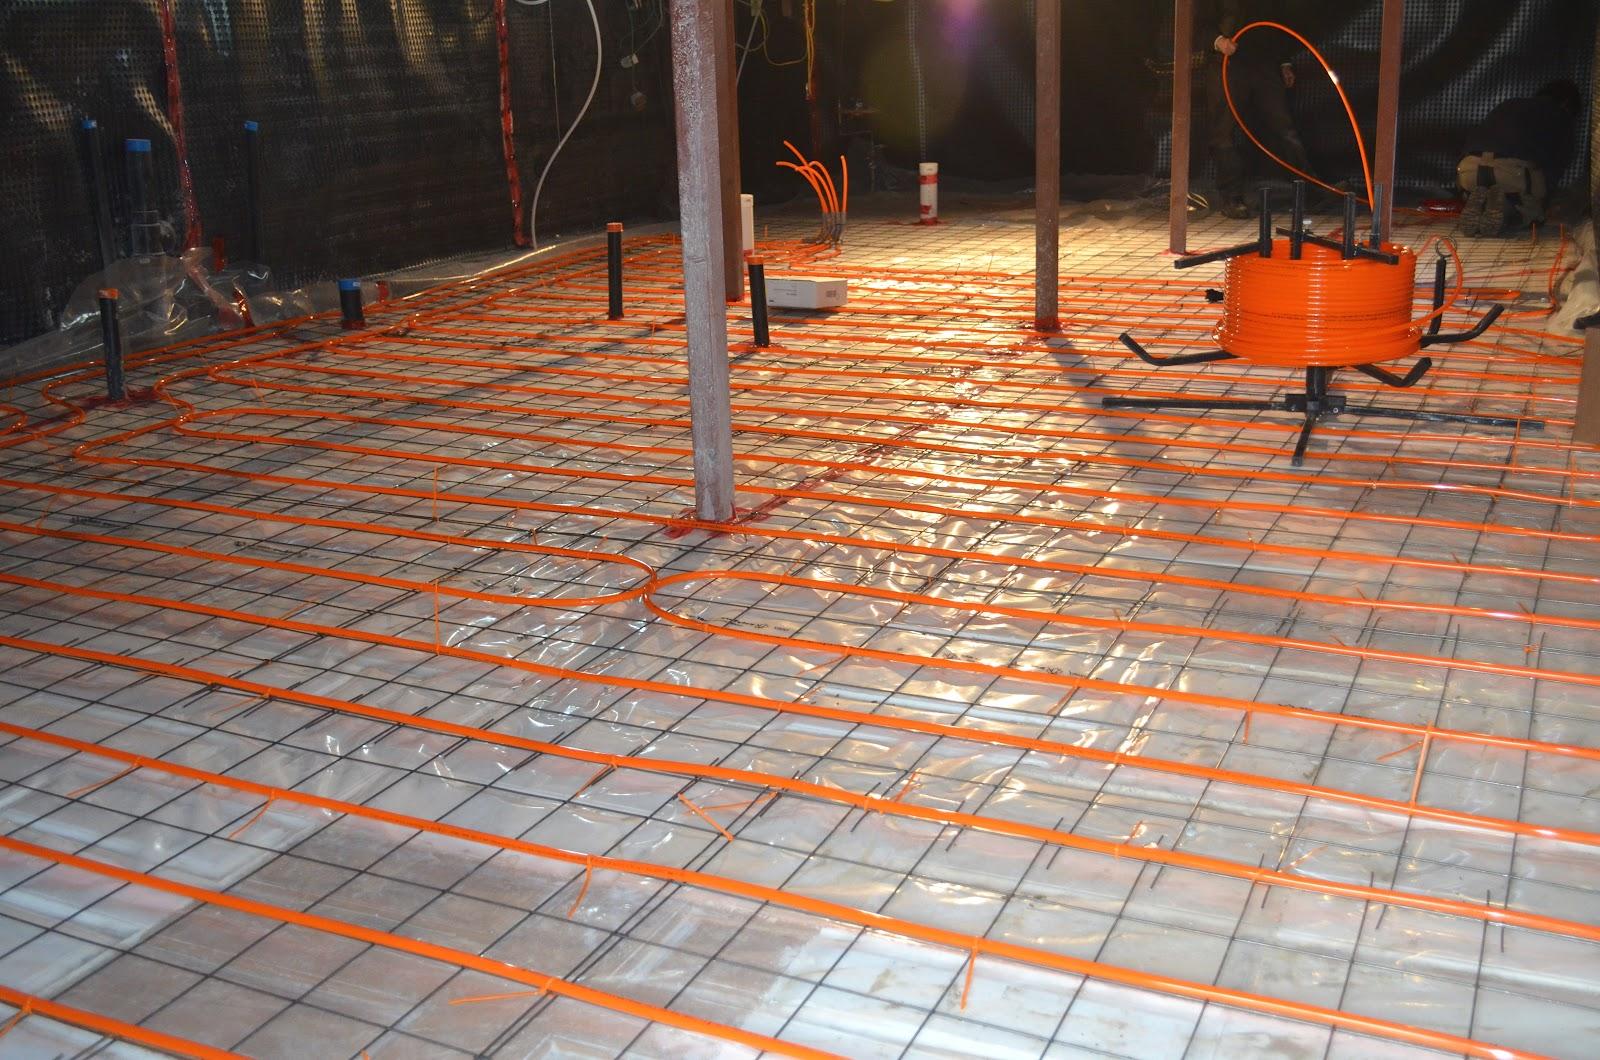 Basement floor heating options awesome basement floor Heating options